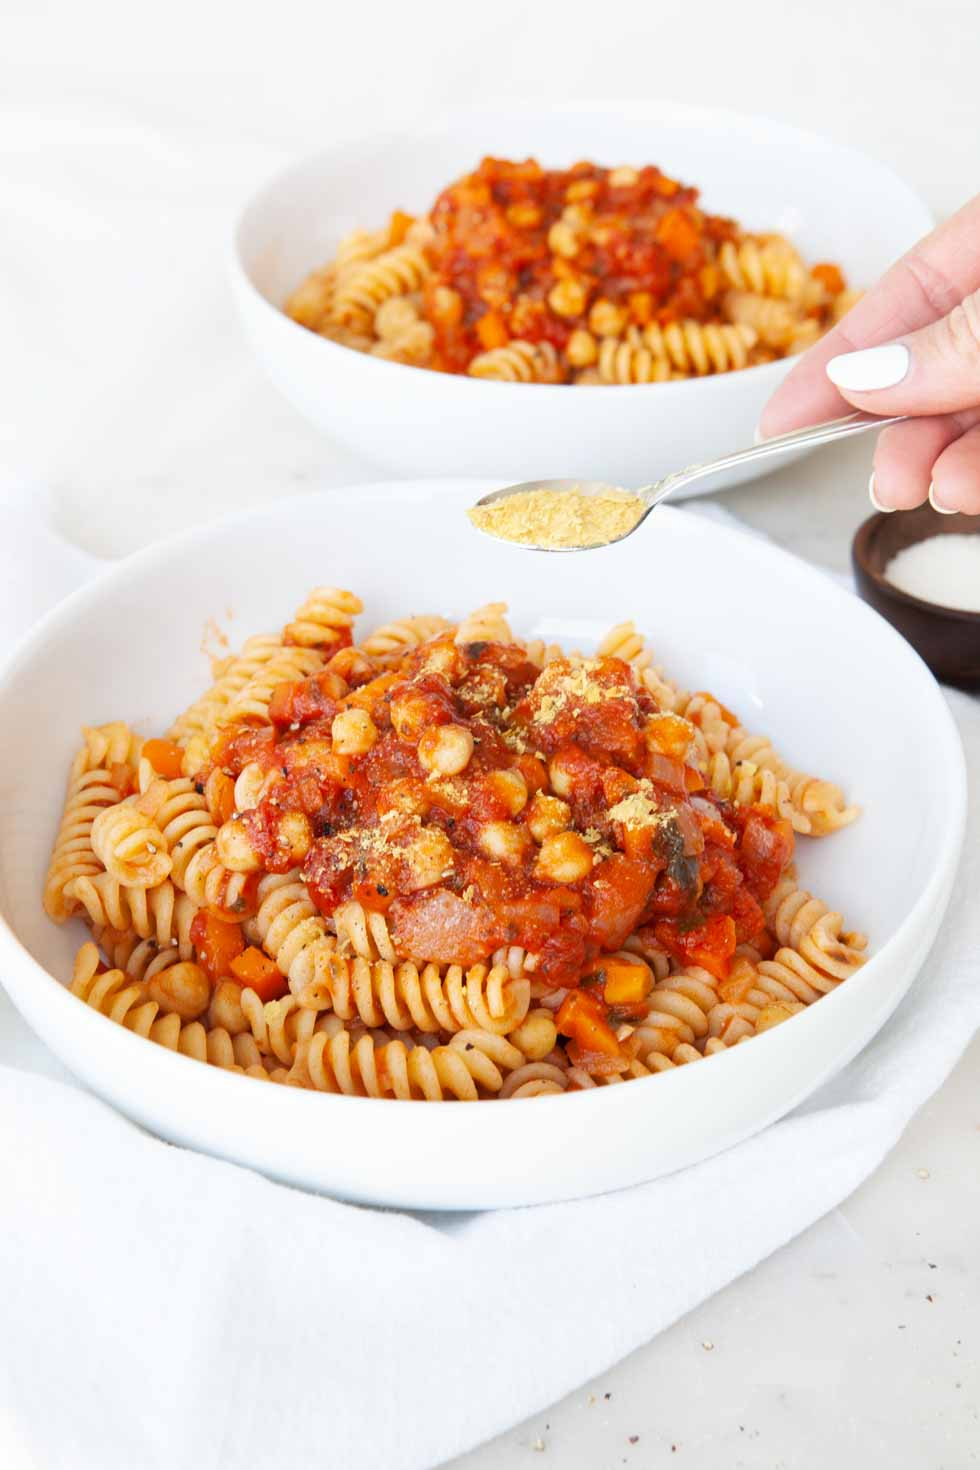 Vegan Pasta with Chickpea & Tomato Sauce